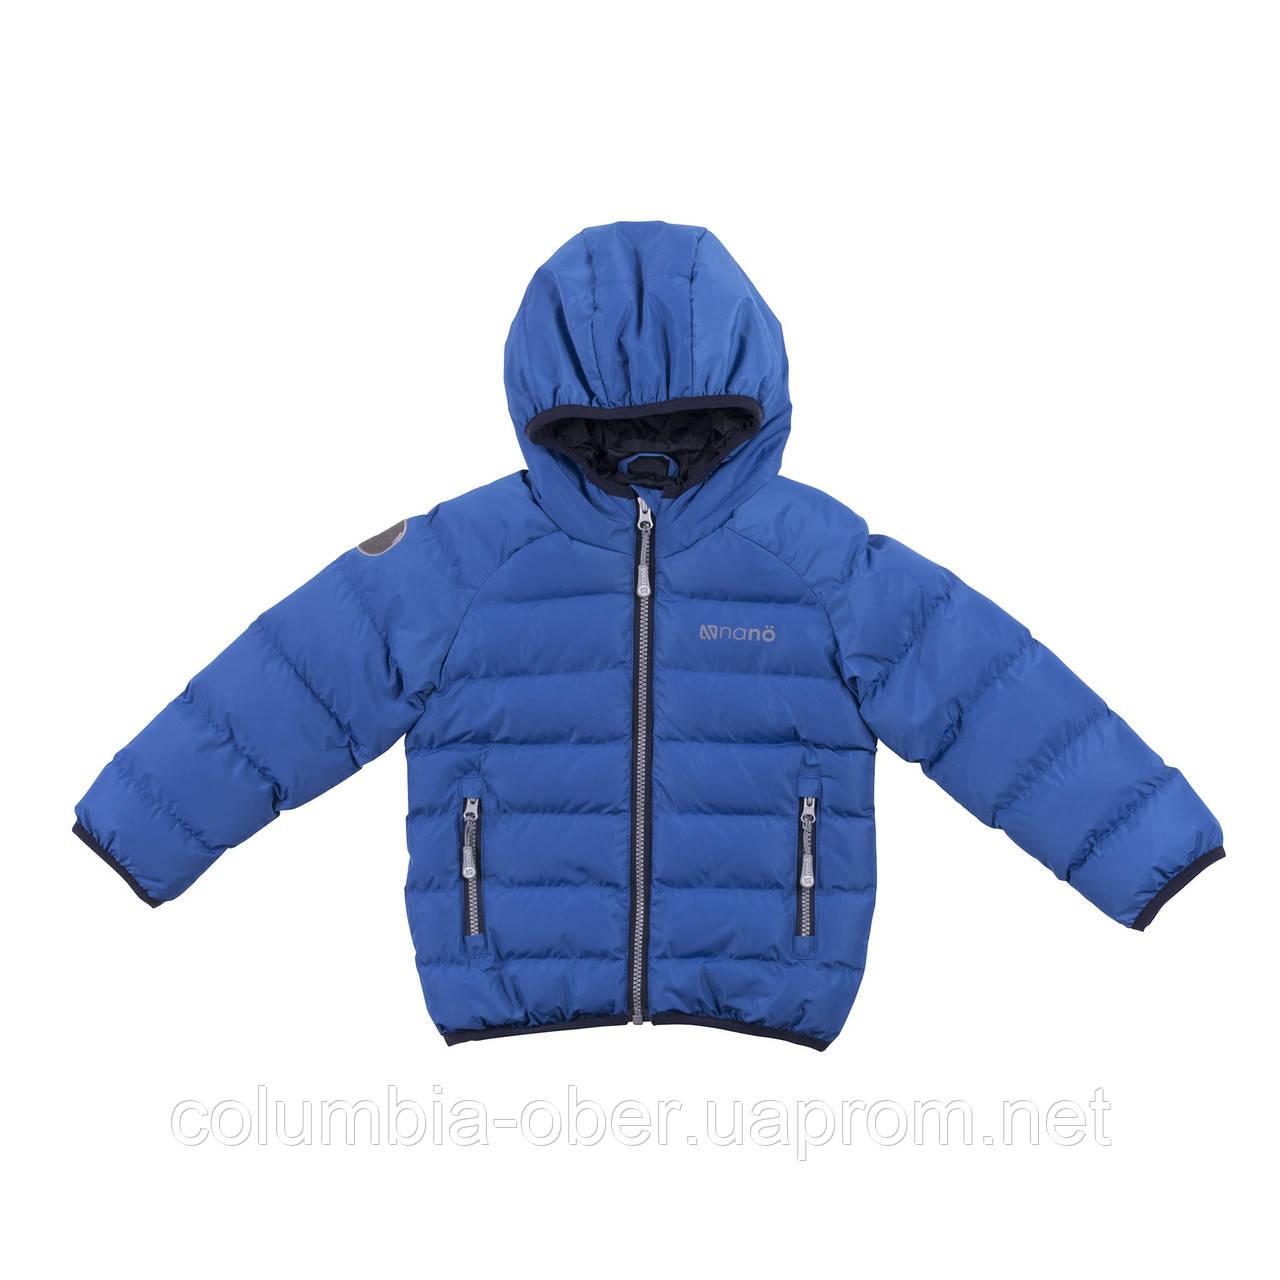 Демисезонная куртка для мальчика NANO F18 M 1251 Imperial Blue. Размеры 2-14.